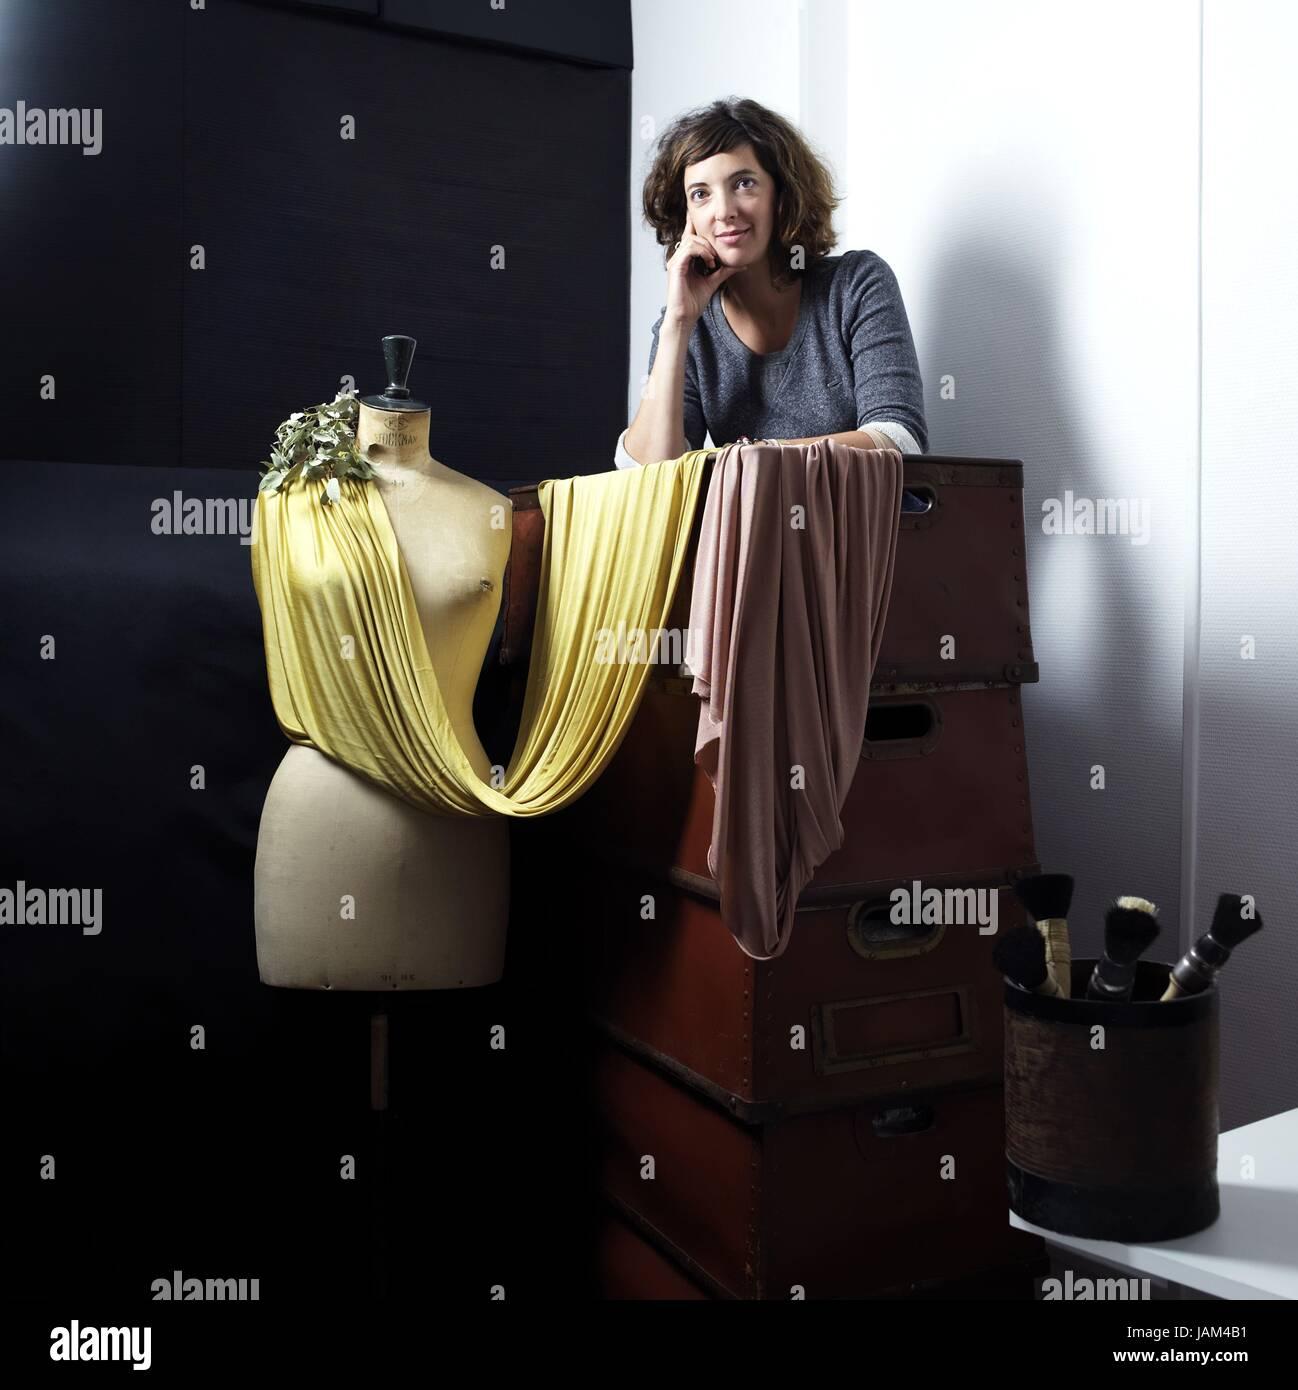 Aurélia Wolff, French fashion designer for the brand Rosa Tapioca.  September 14, 2012 Photo Damien Grenon - Stock Image